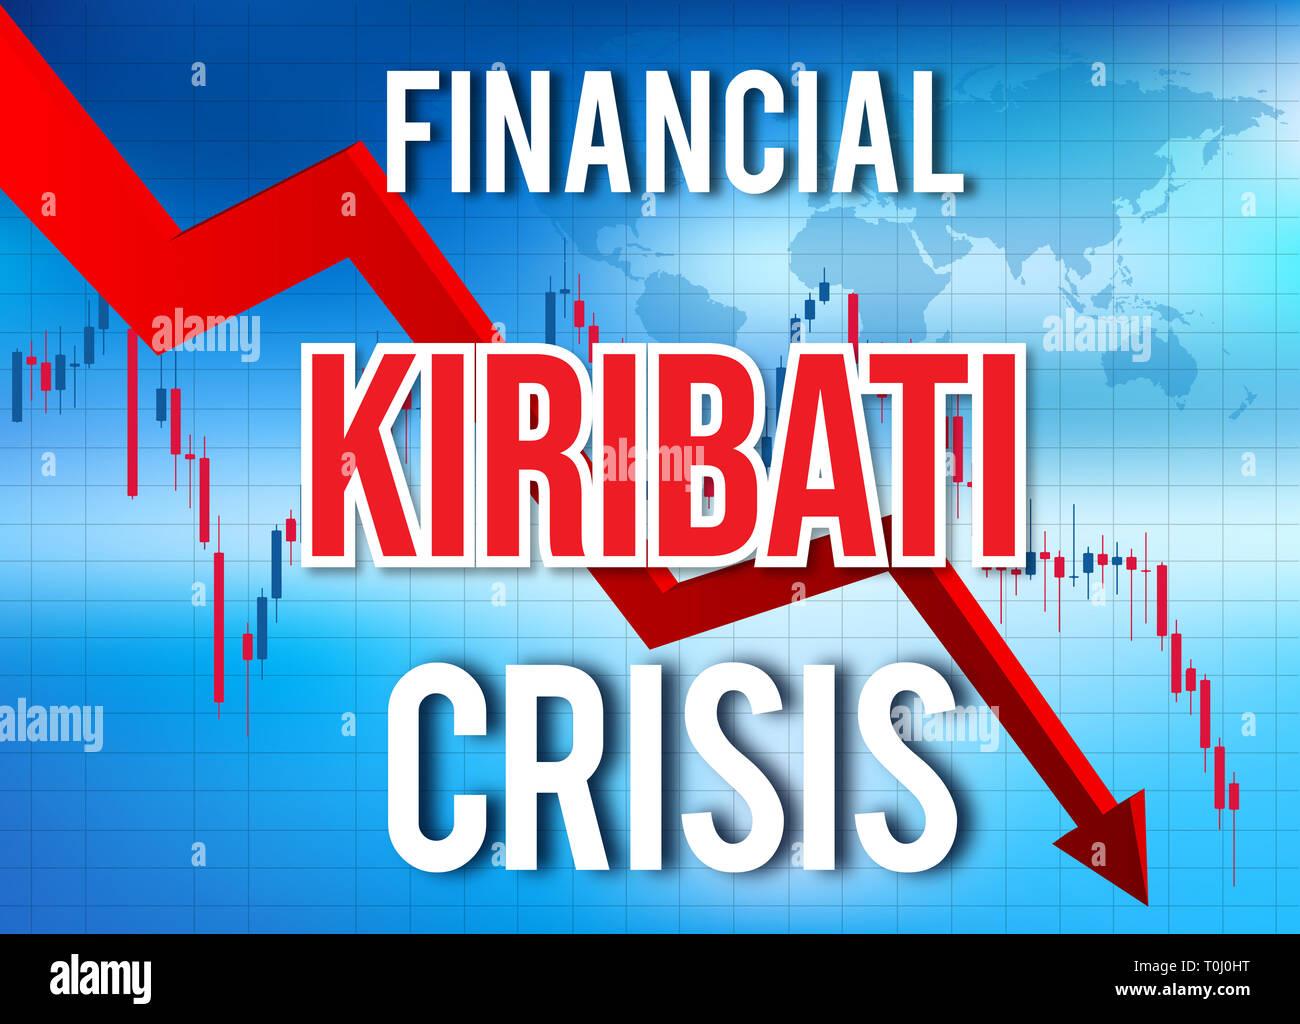 Kiribati Financial Crisis Economic Collapse Market Crash Global Meltdown Illustration. - Stock Image